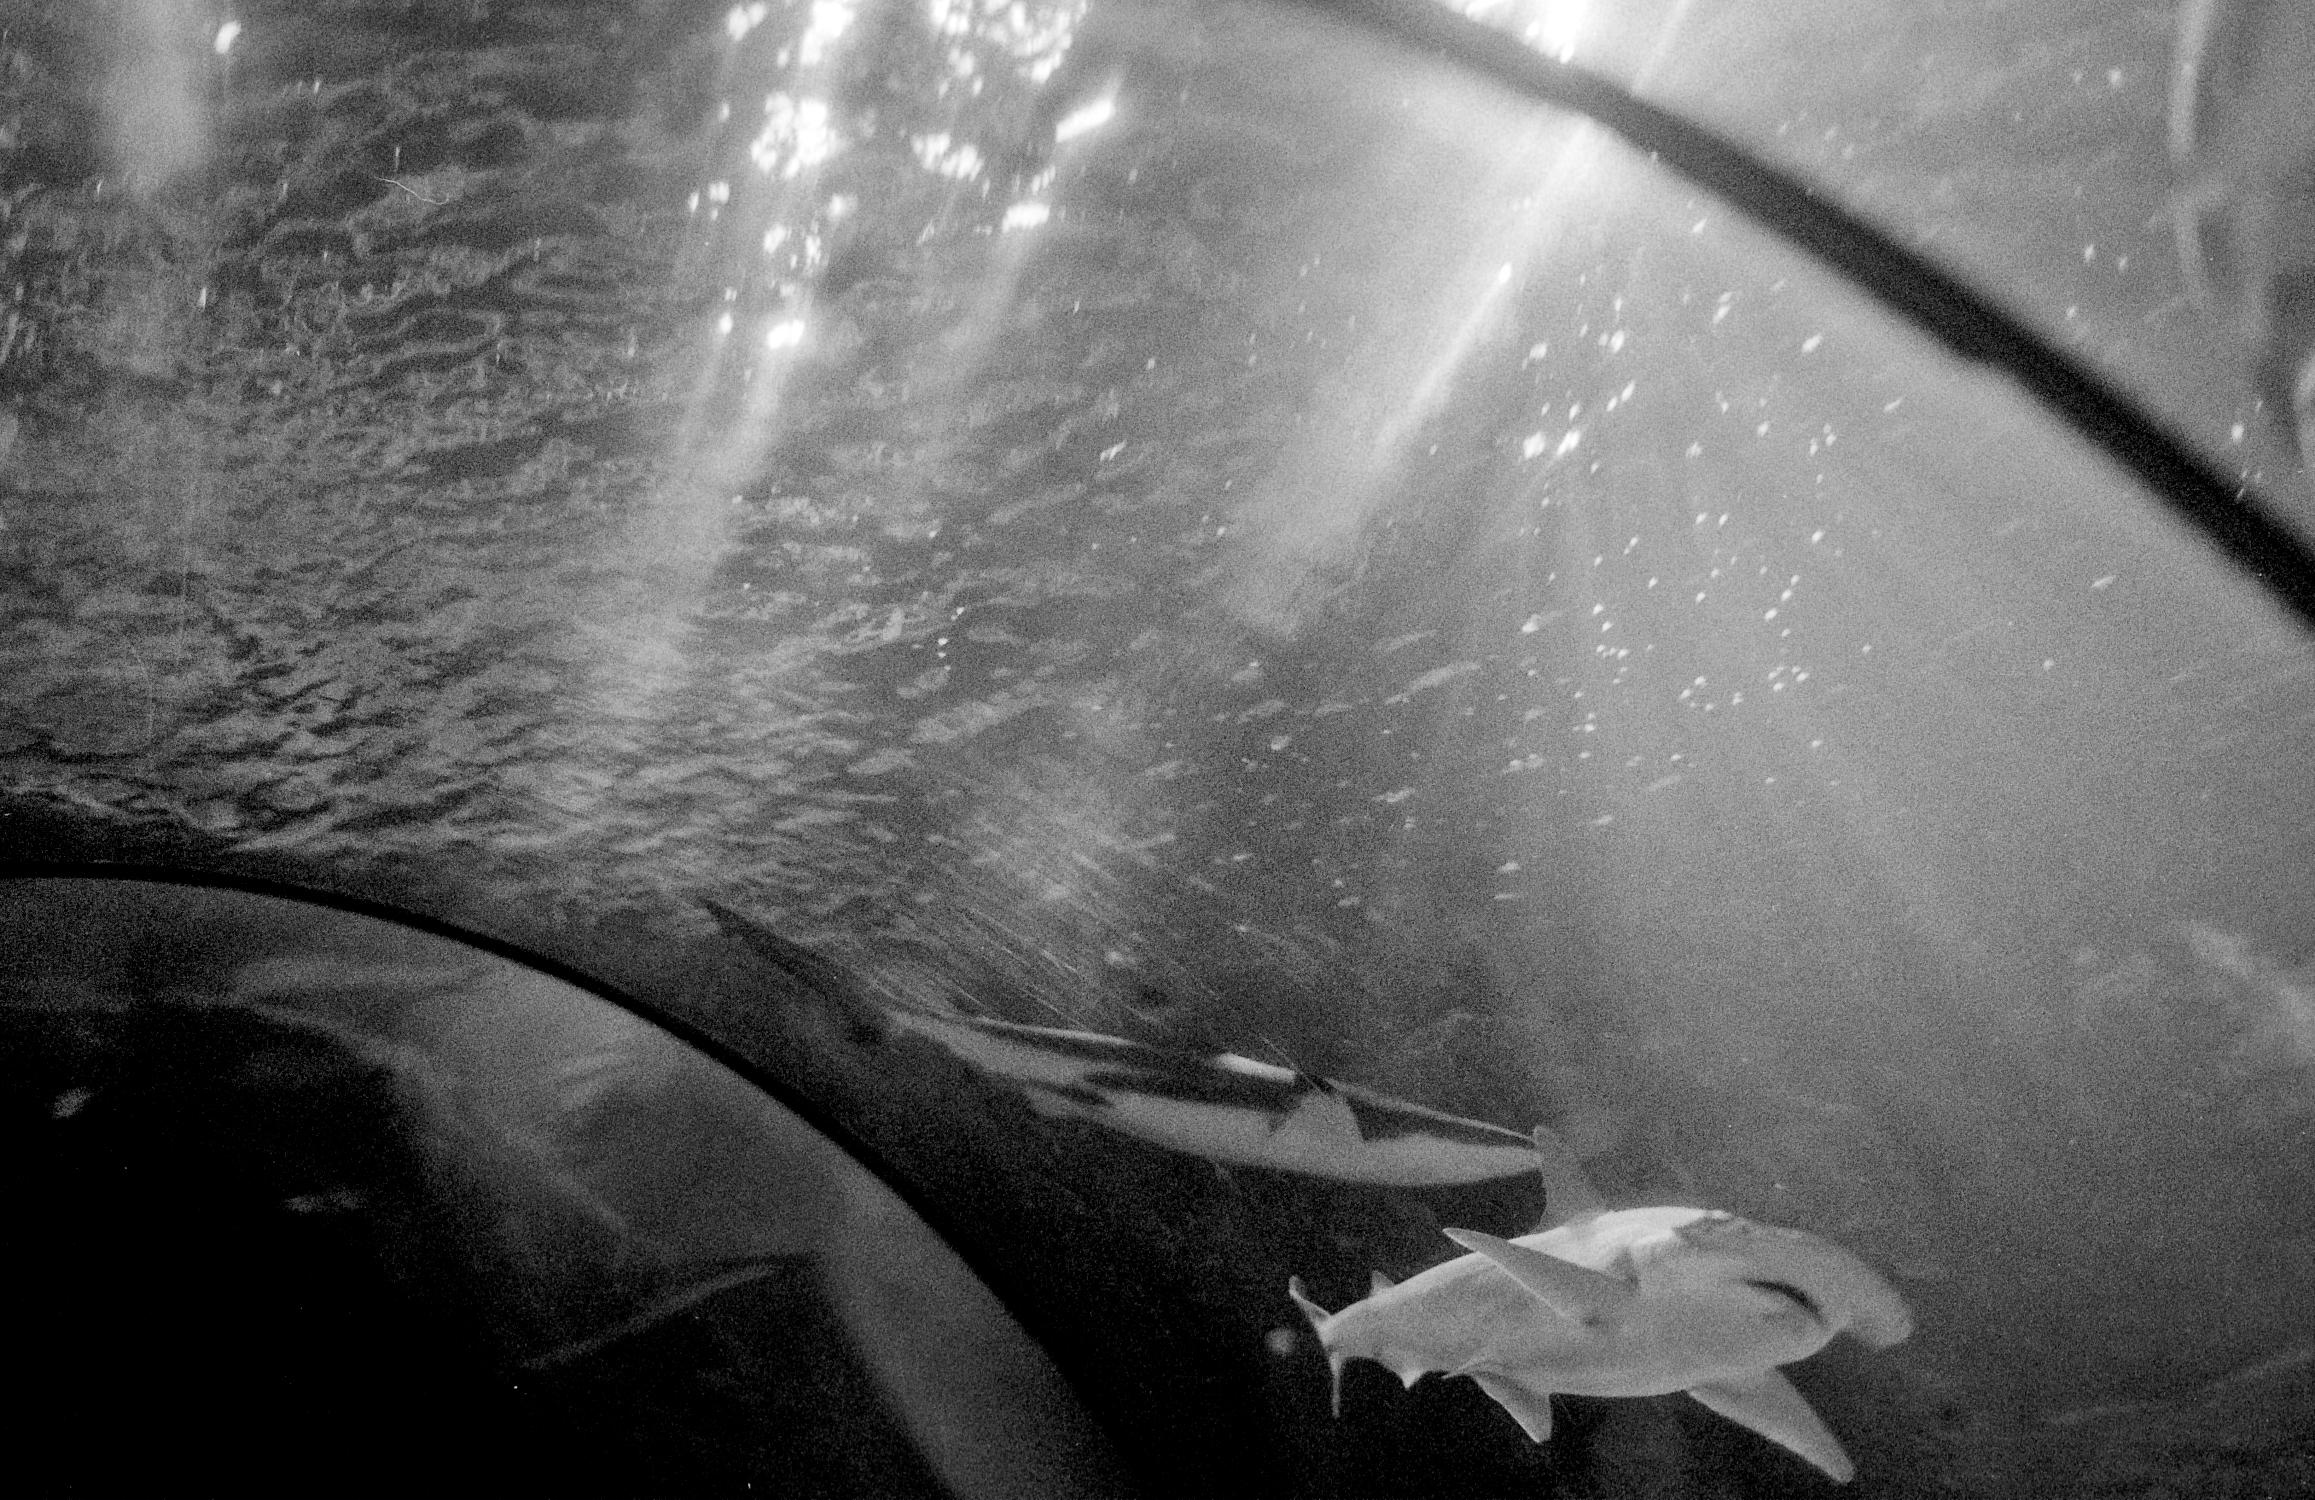 Sharks in aquarium tank (Pic: Stephen Dowling)